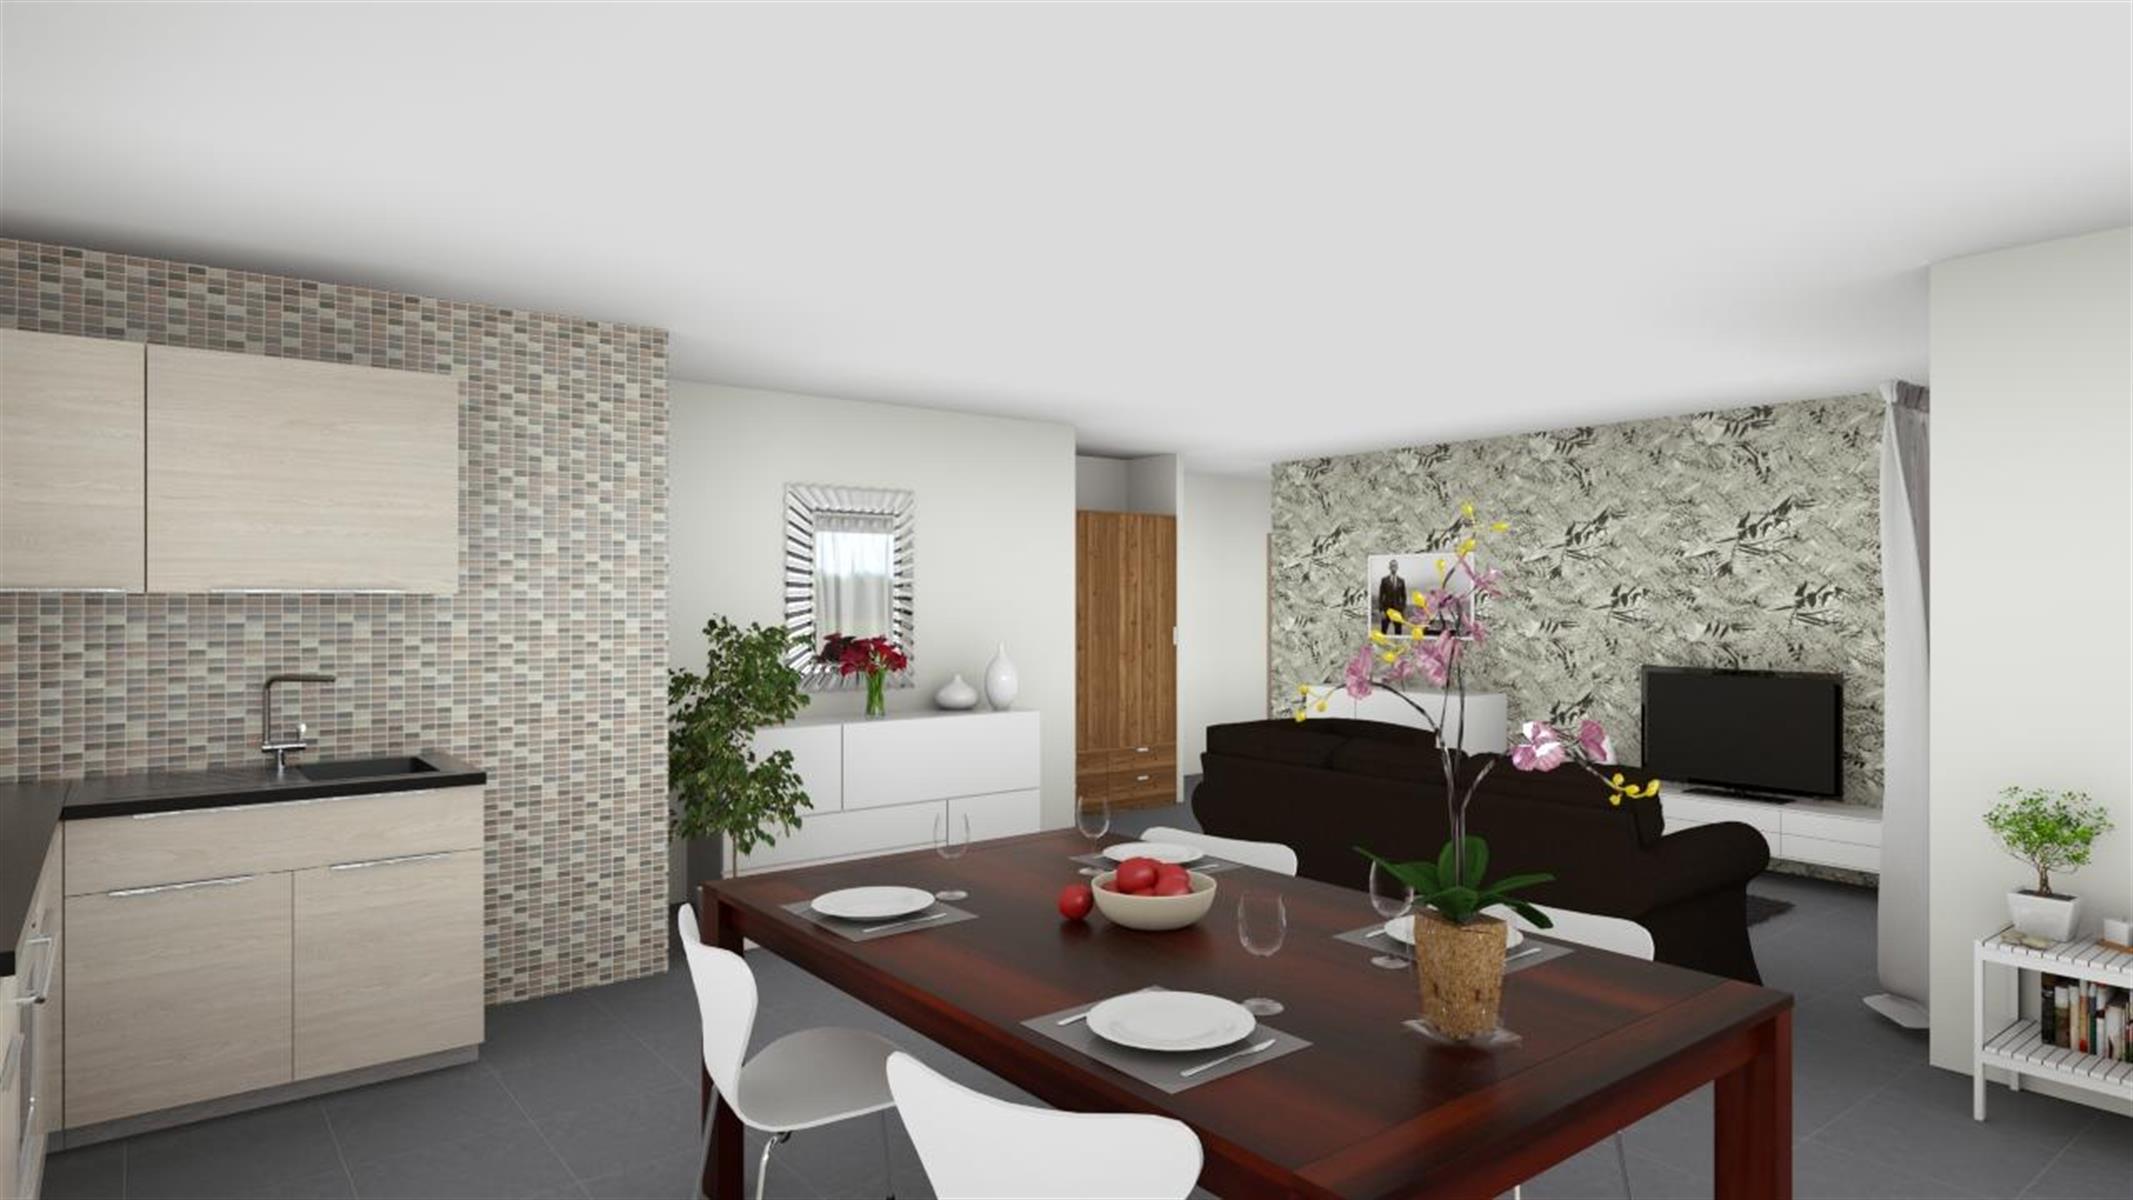 Appartement de standing 2 chambres avec terrasse